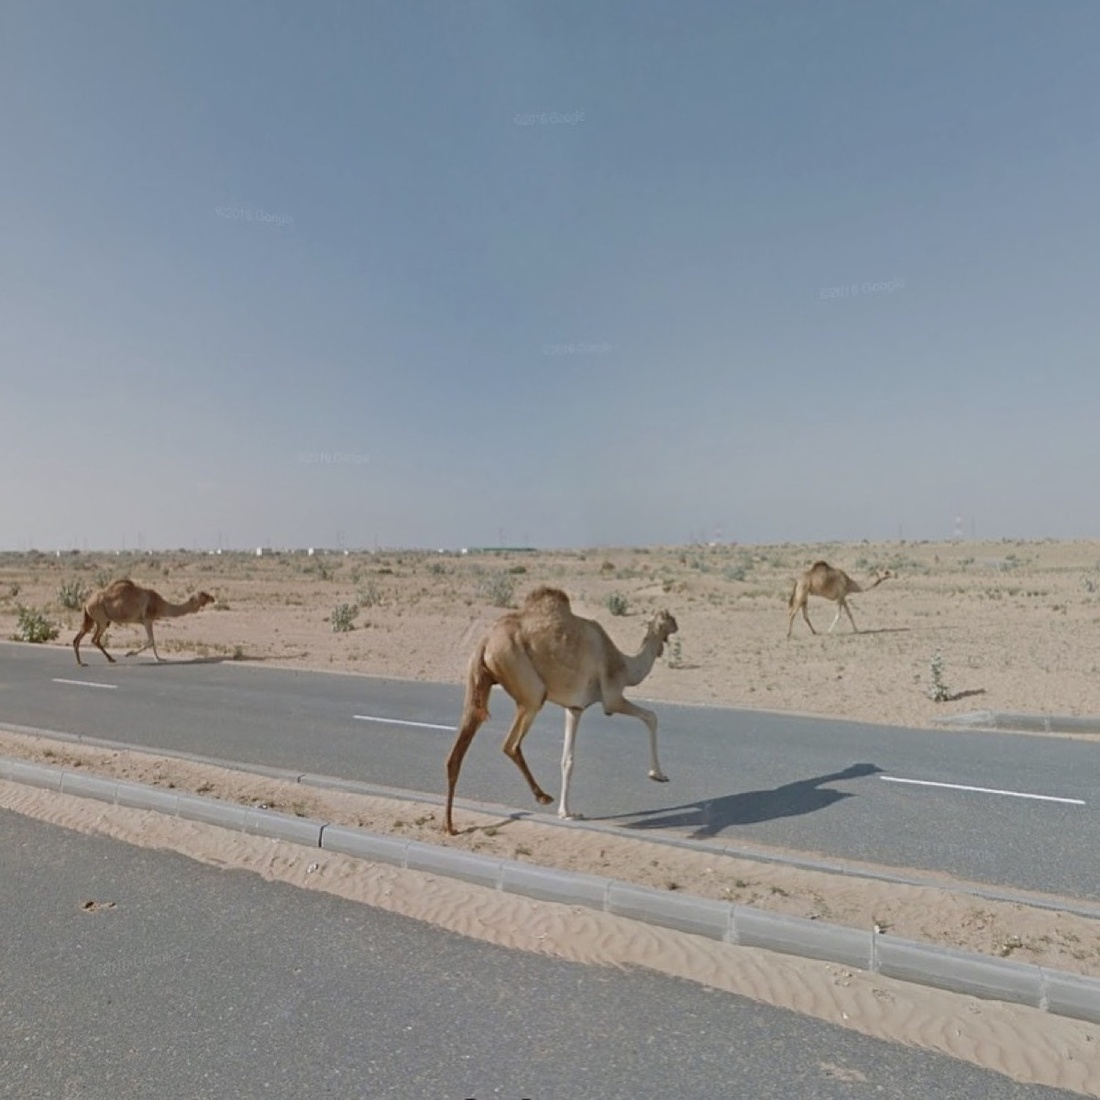 Sharjah, United Arab Emirates. Photograph by Jacqui Kenny via Google Street View.